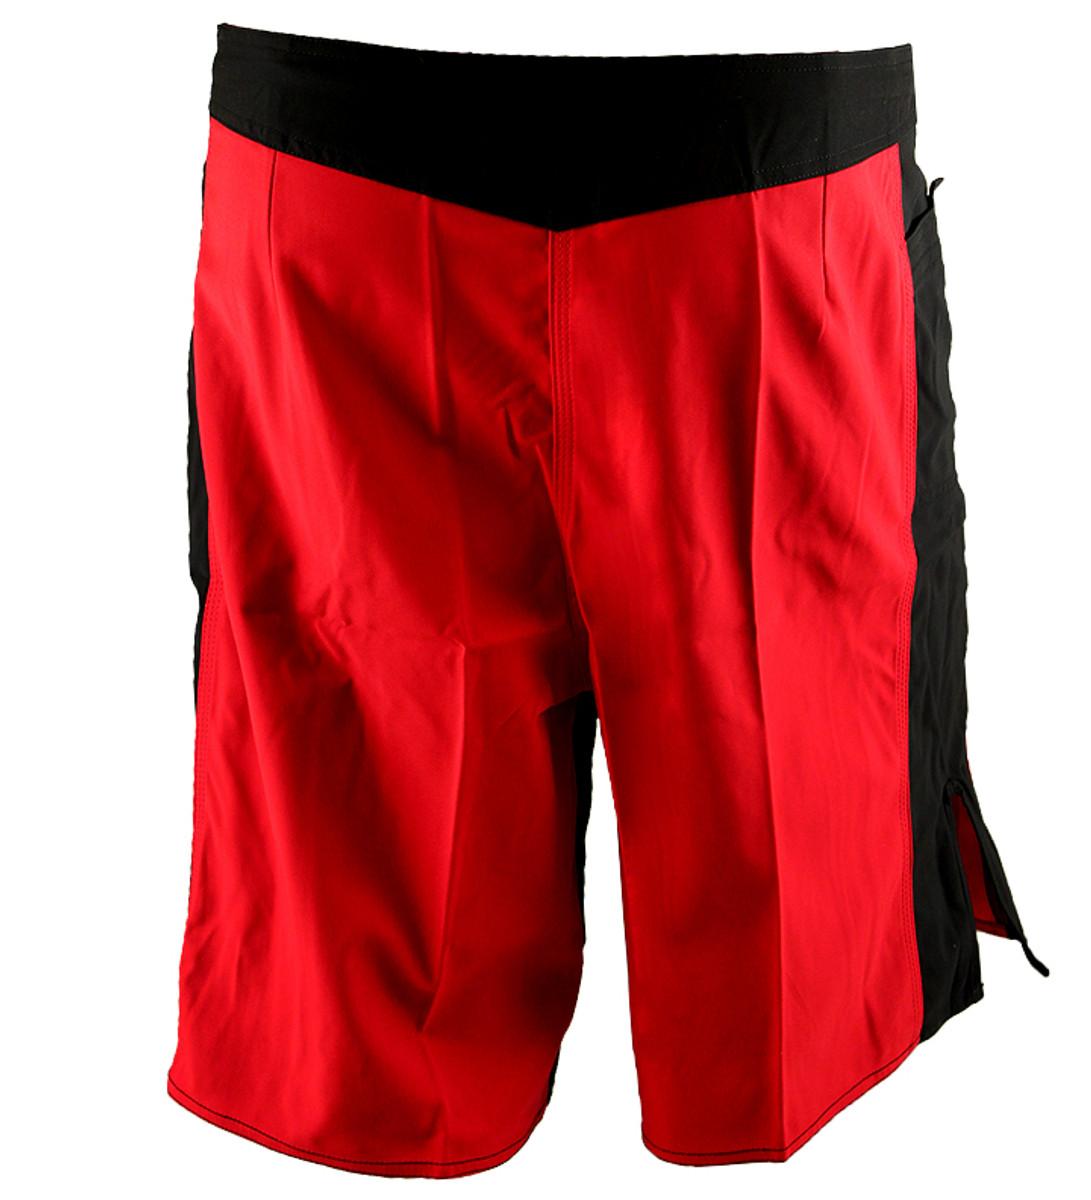 Details about  /EPIC MMA GEAR BLANK WOD MMA SHORTS NO LOGO,BLACK,32